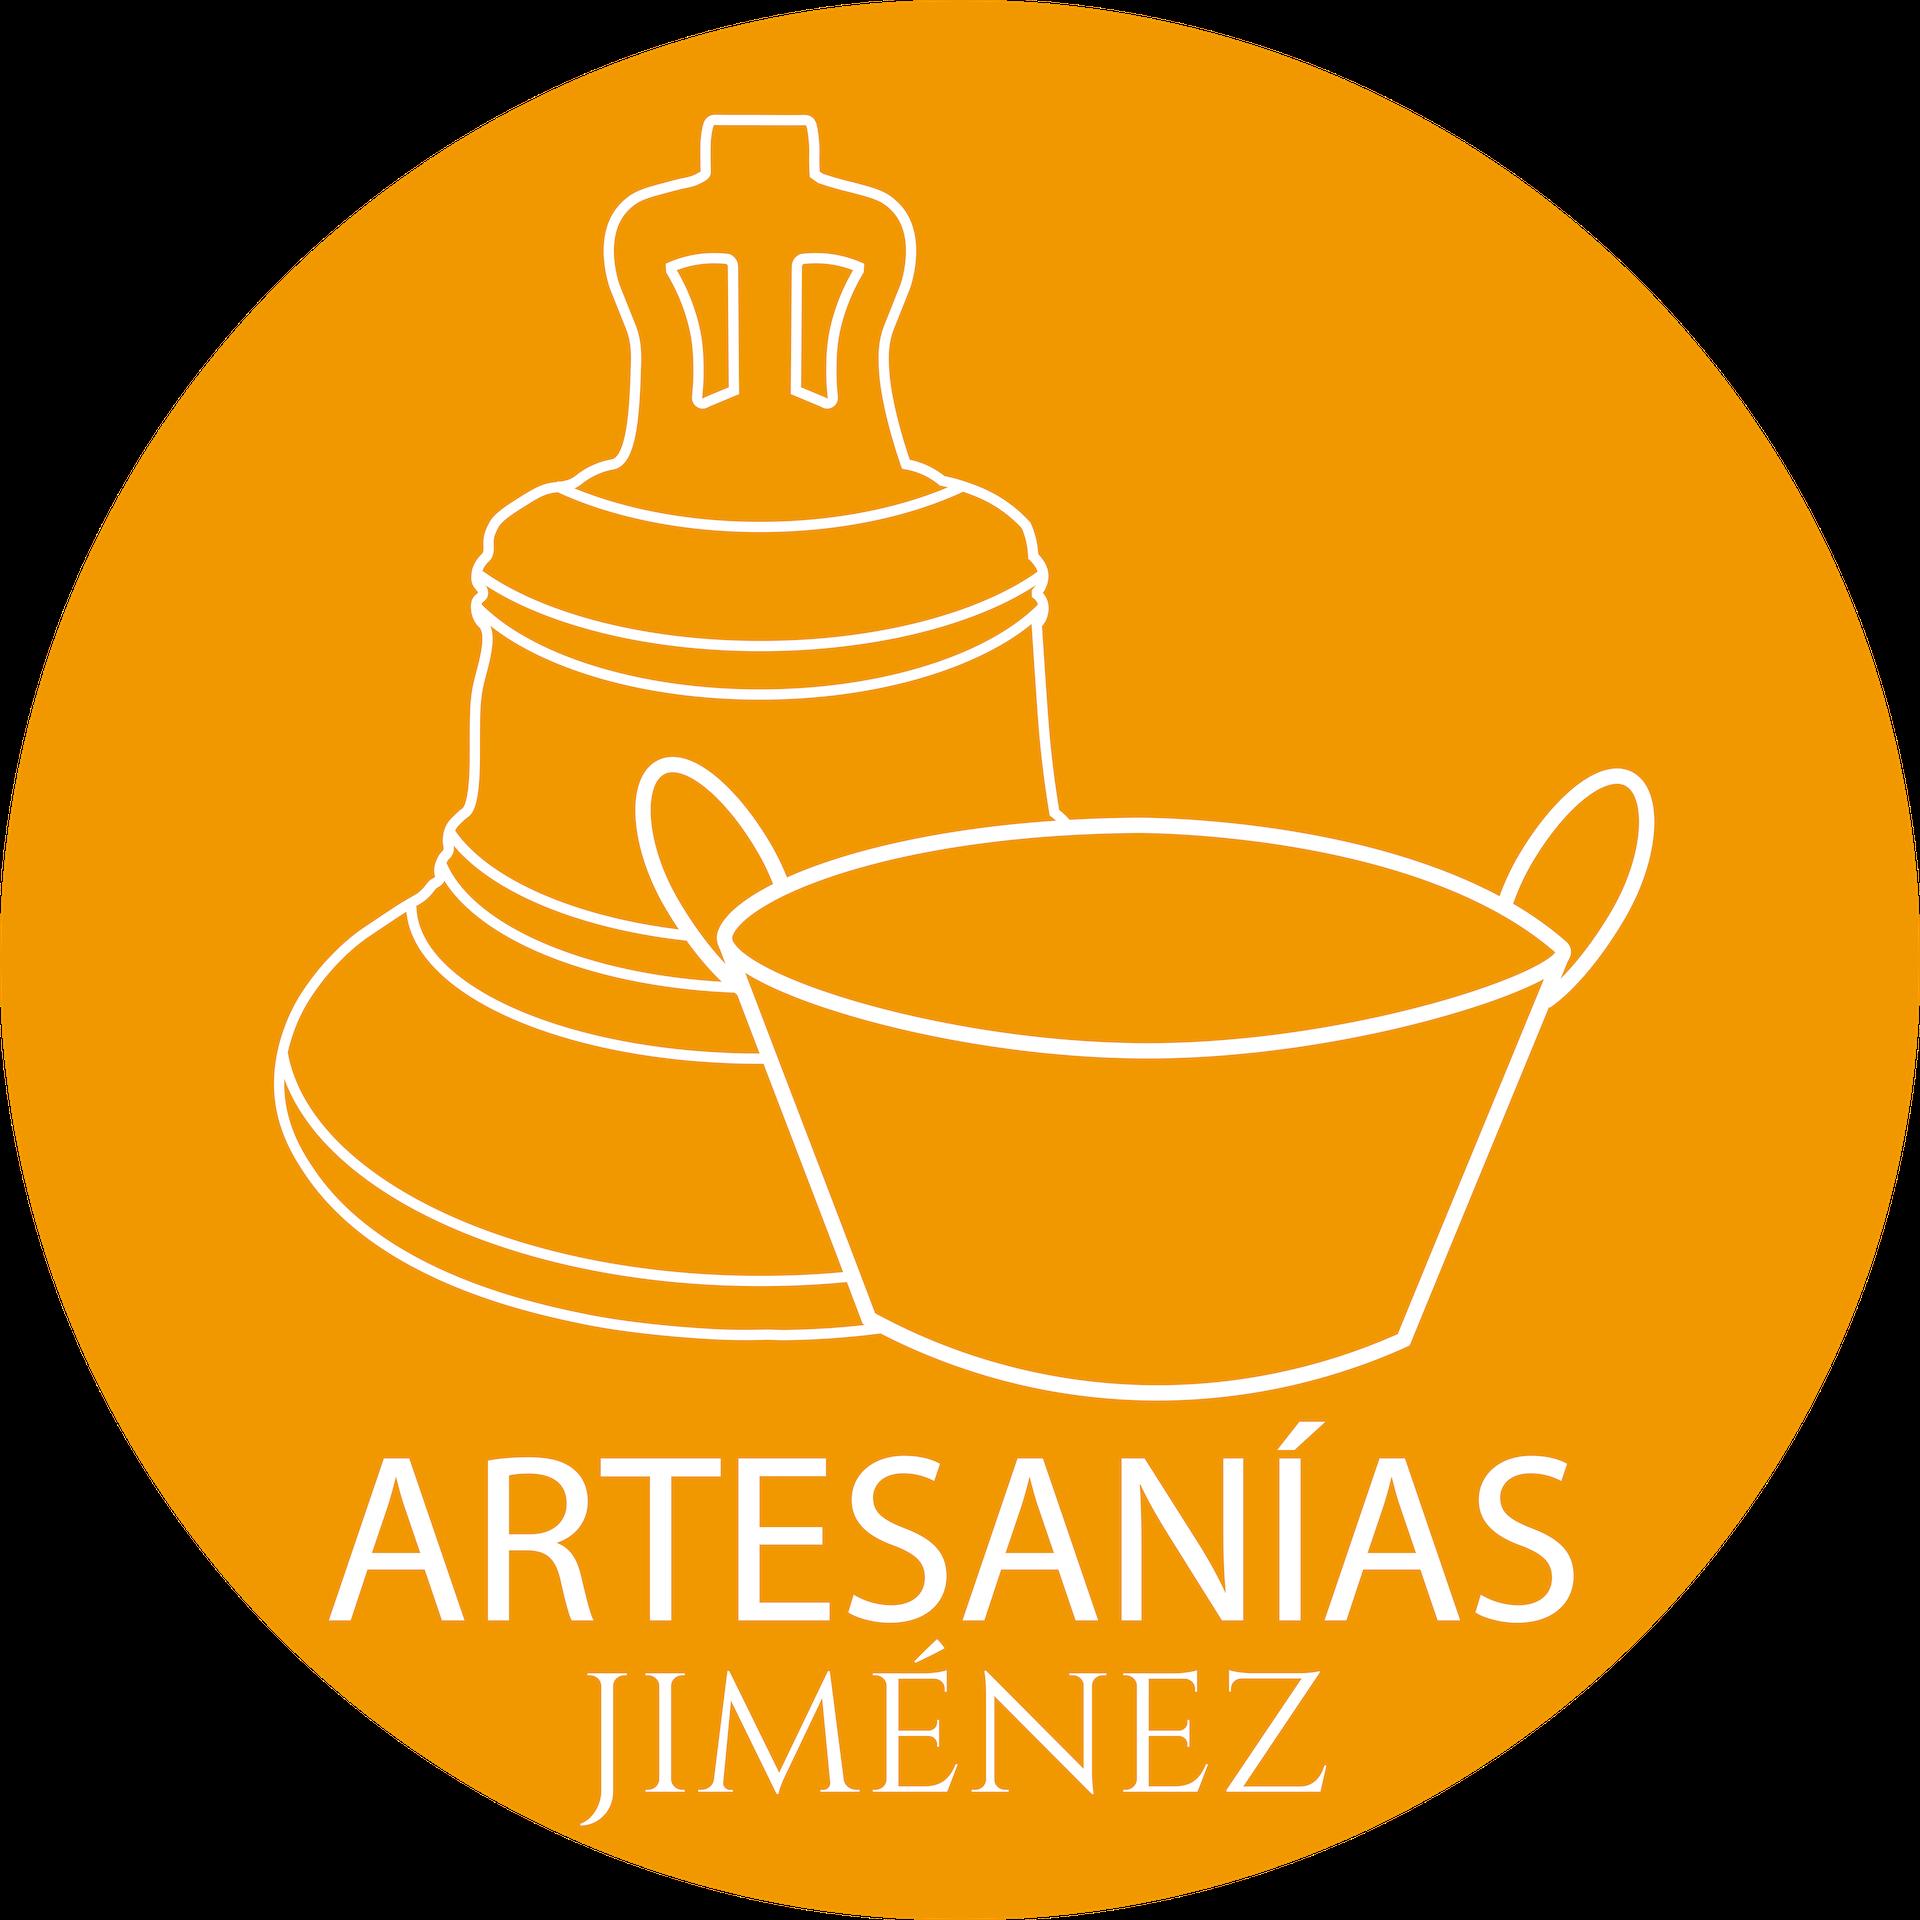 ARTESANIASJIMENEZ.COM